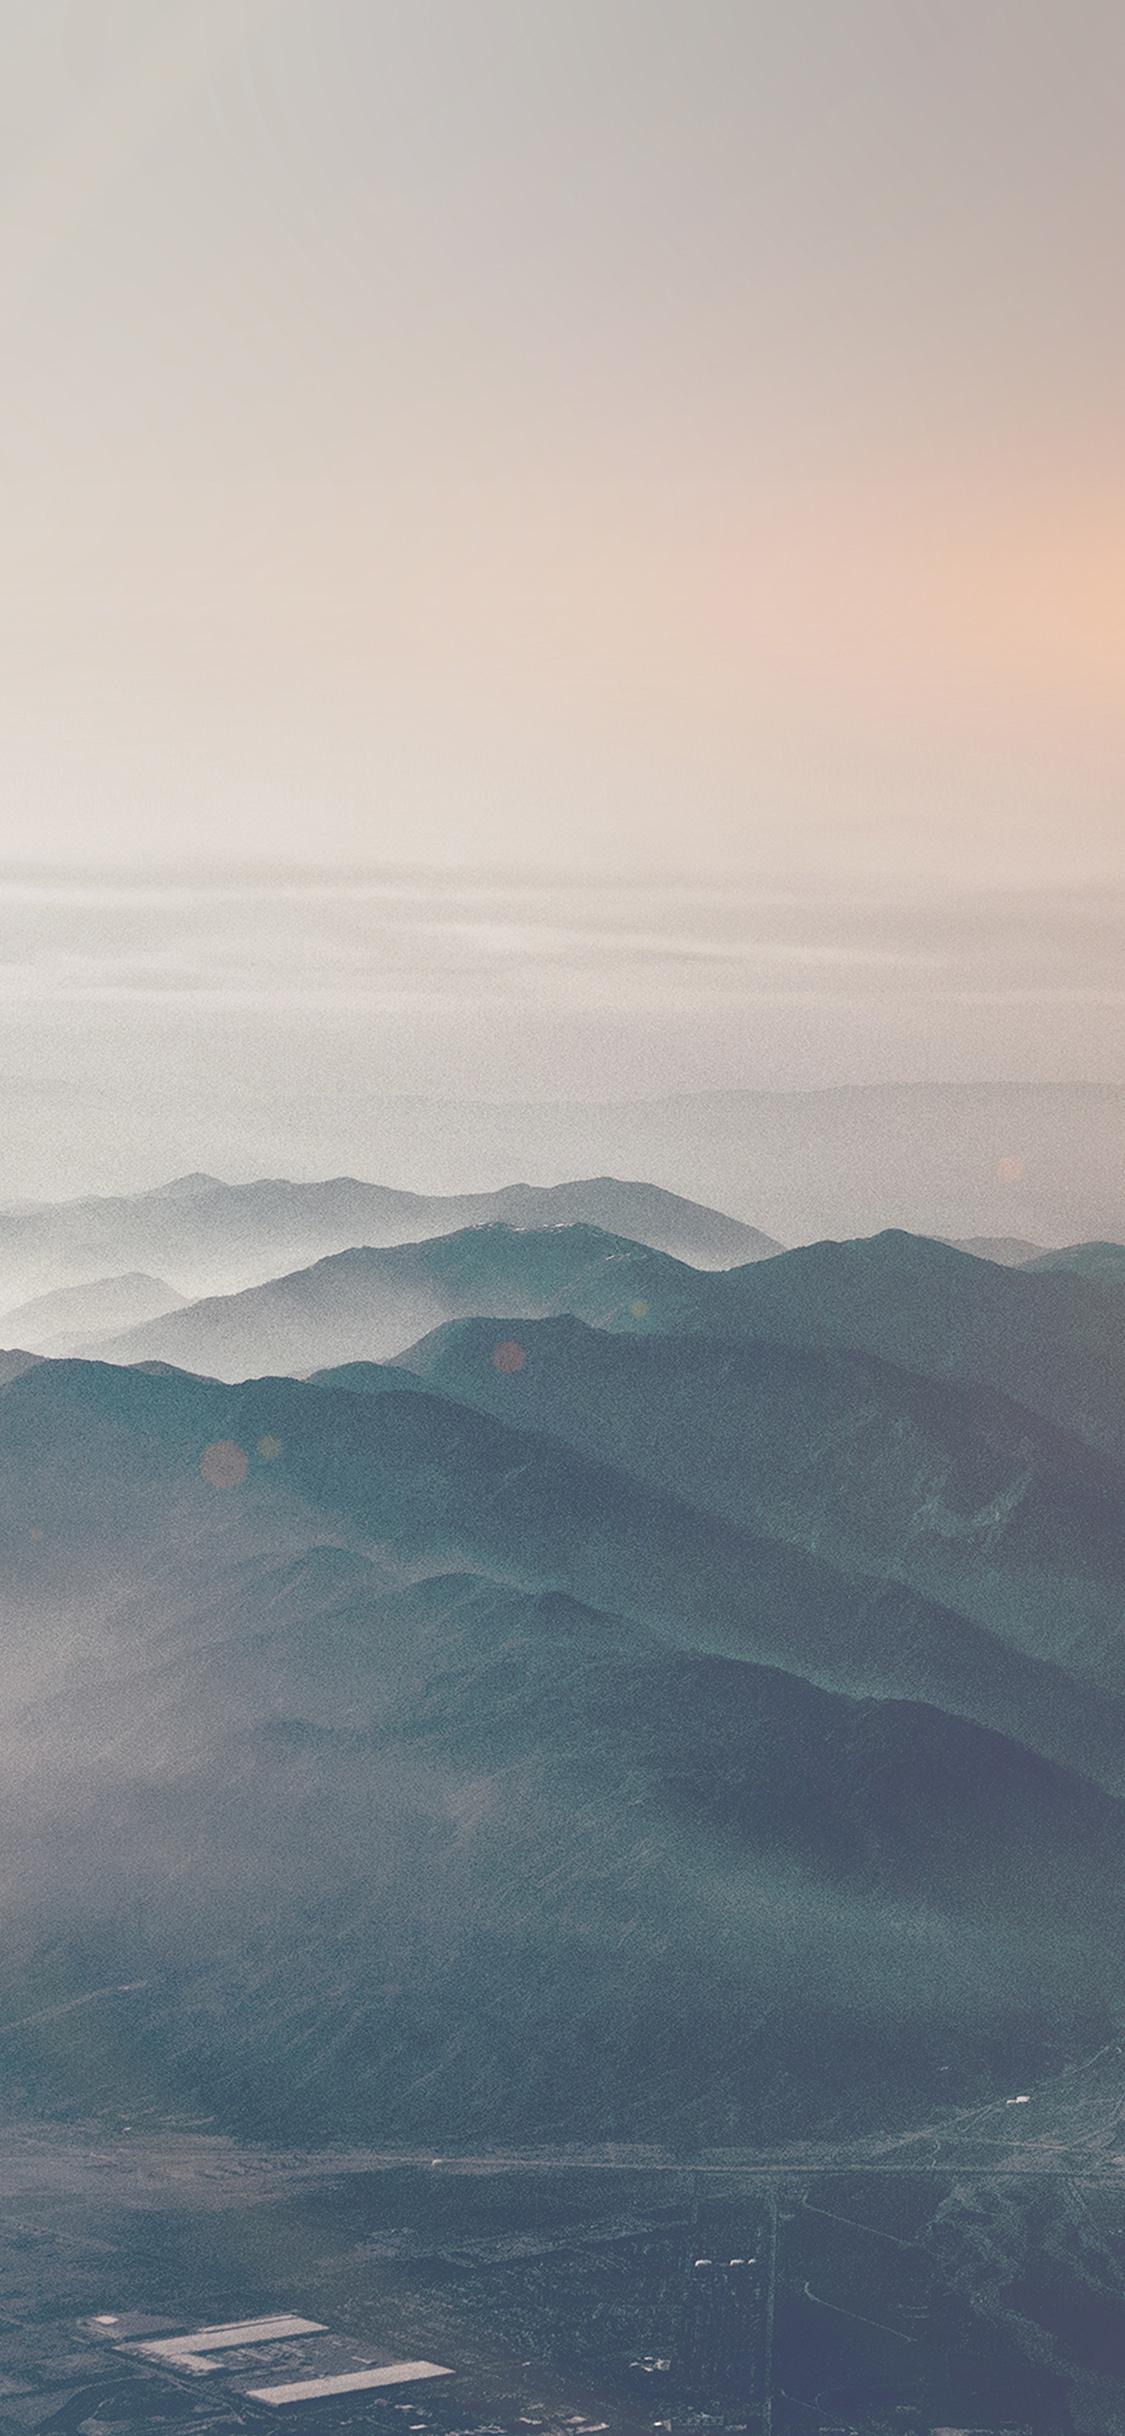 iPhonexpapers.com-Apple-iPhone-wallpaper-mu43-mountain-fog-nature-blue-flare-sky-view